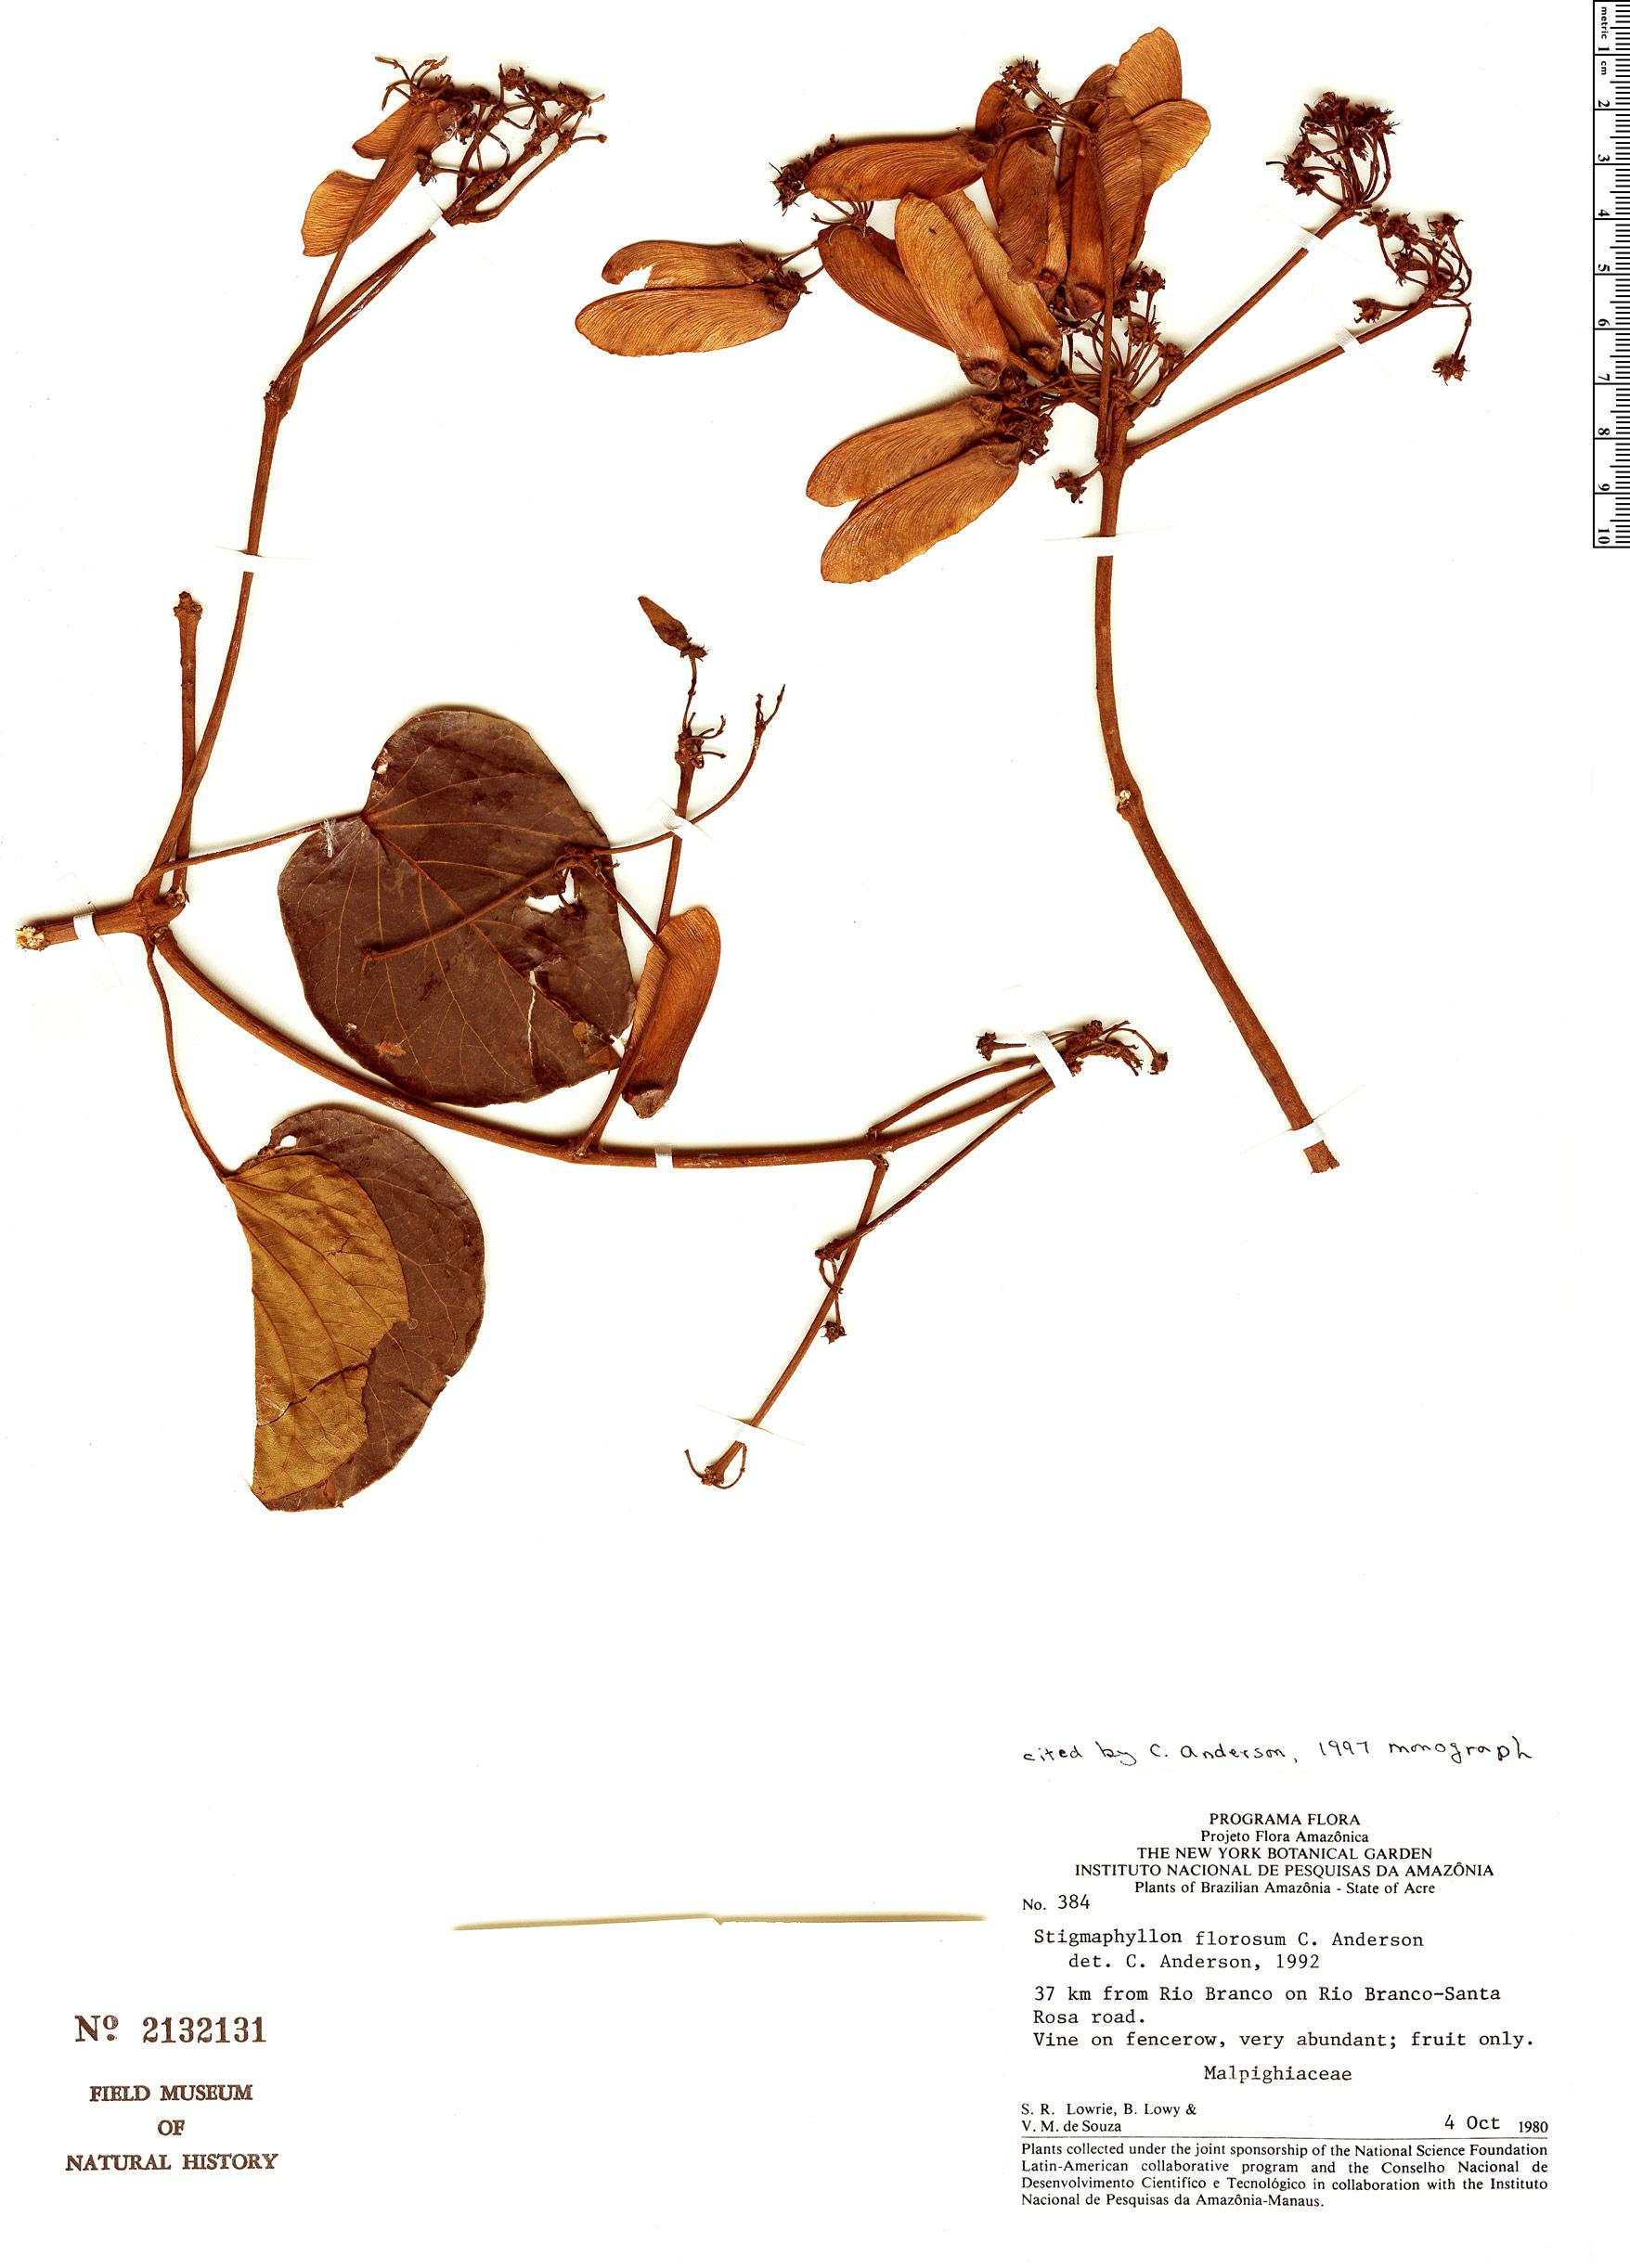 Specimen: Stigmaphyllon florosum